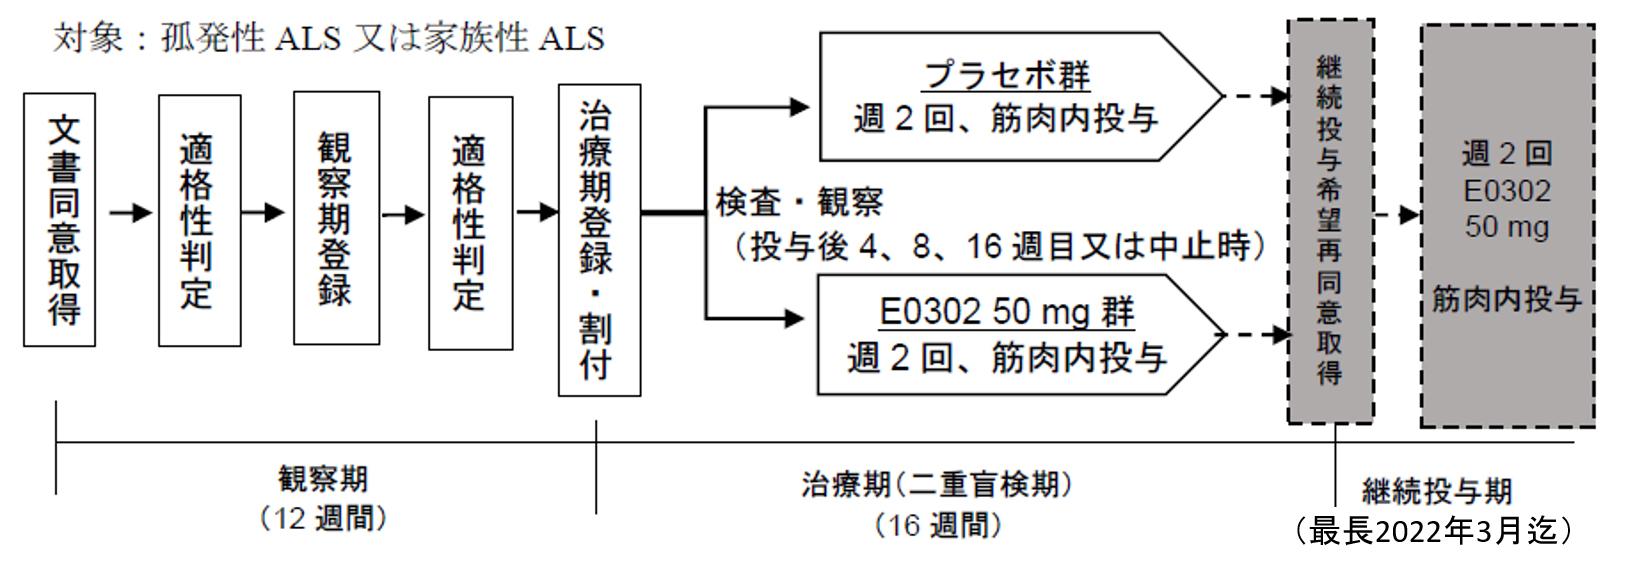 ALS治験スケジュール